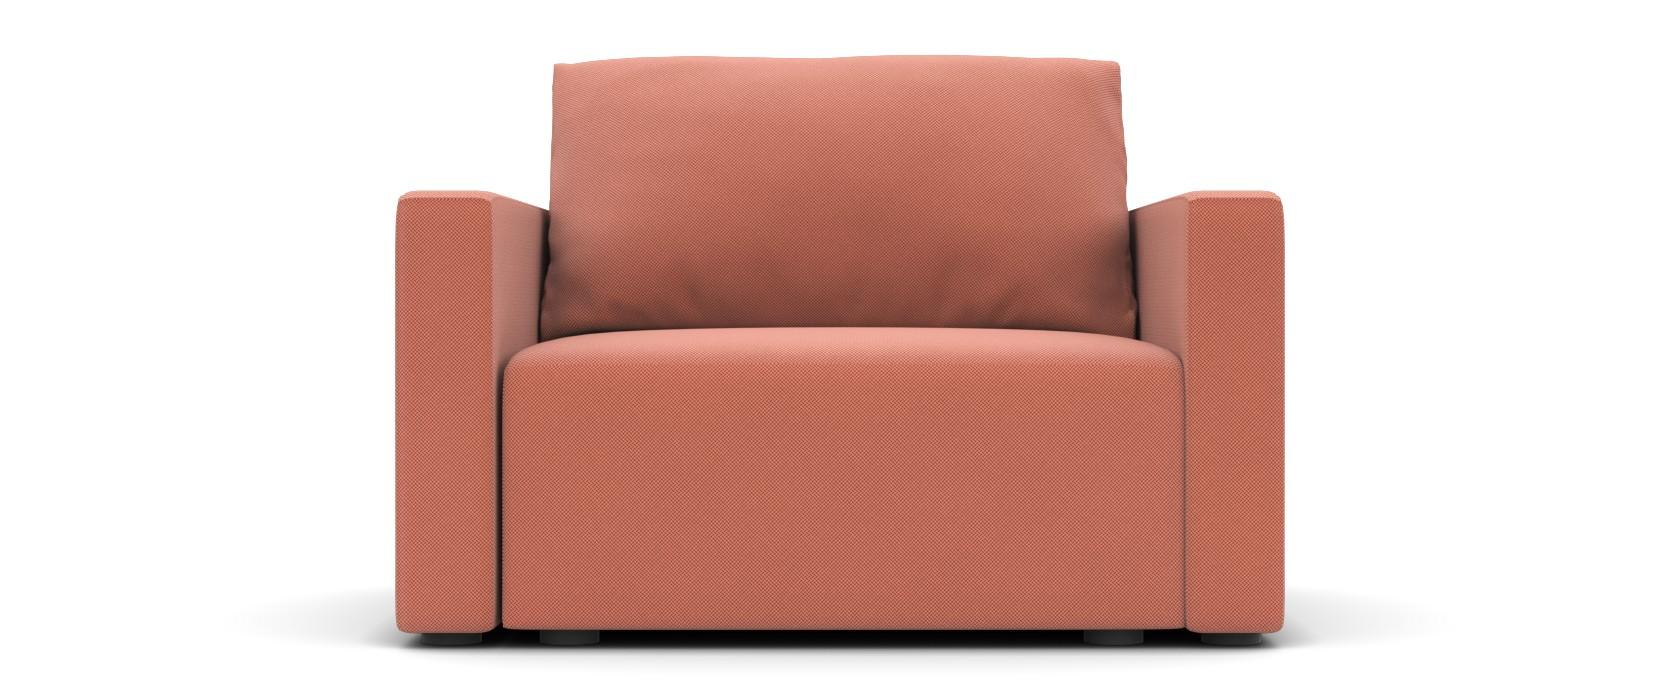 Кресло Greta - Pufetto